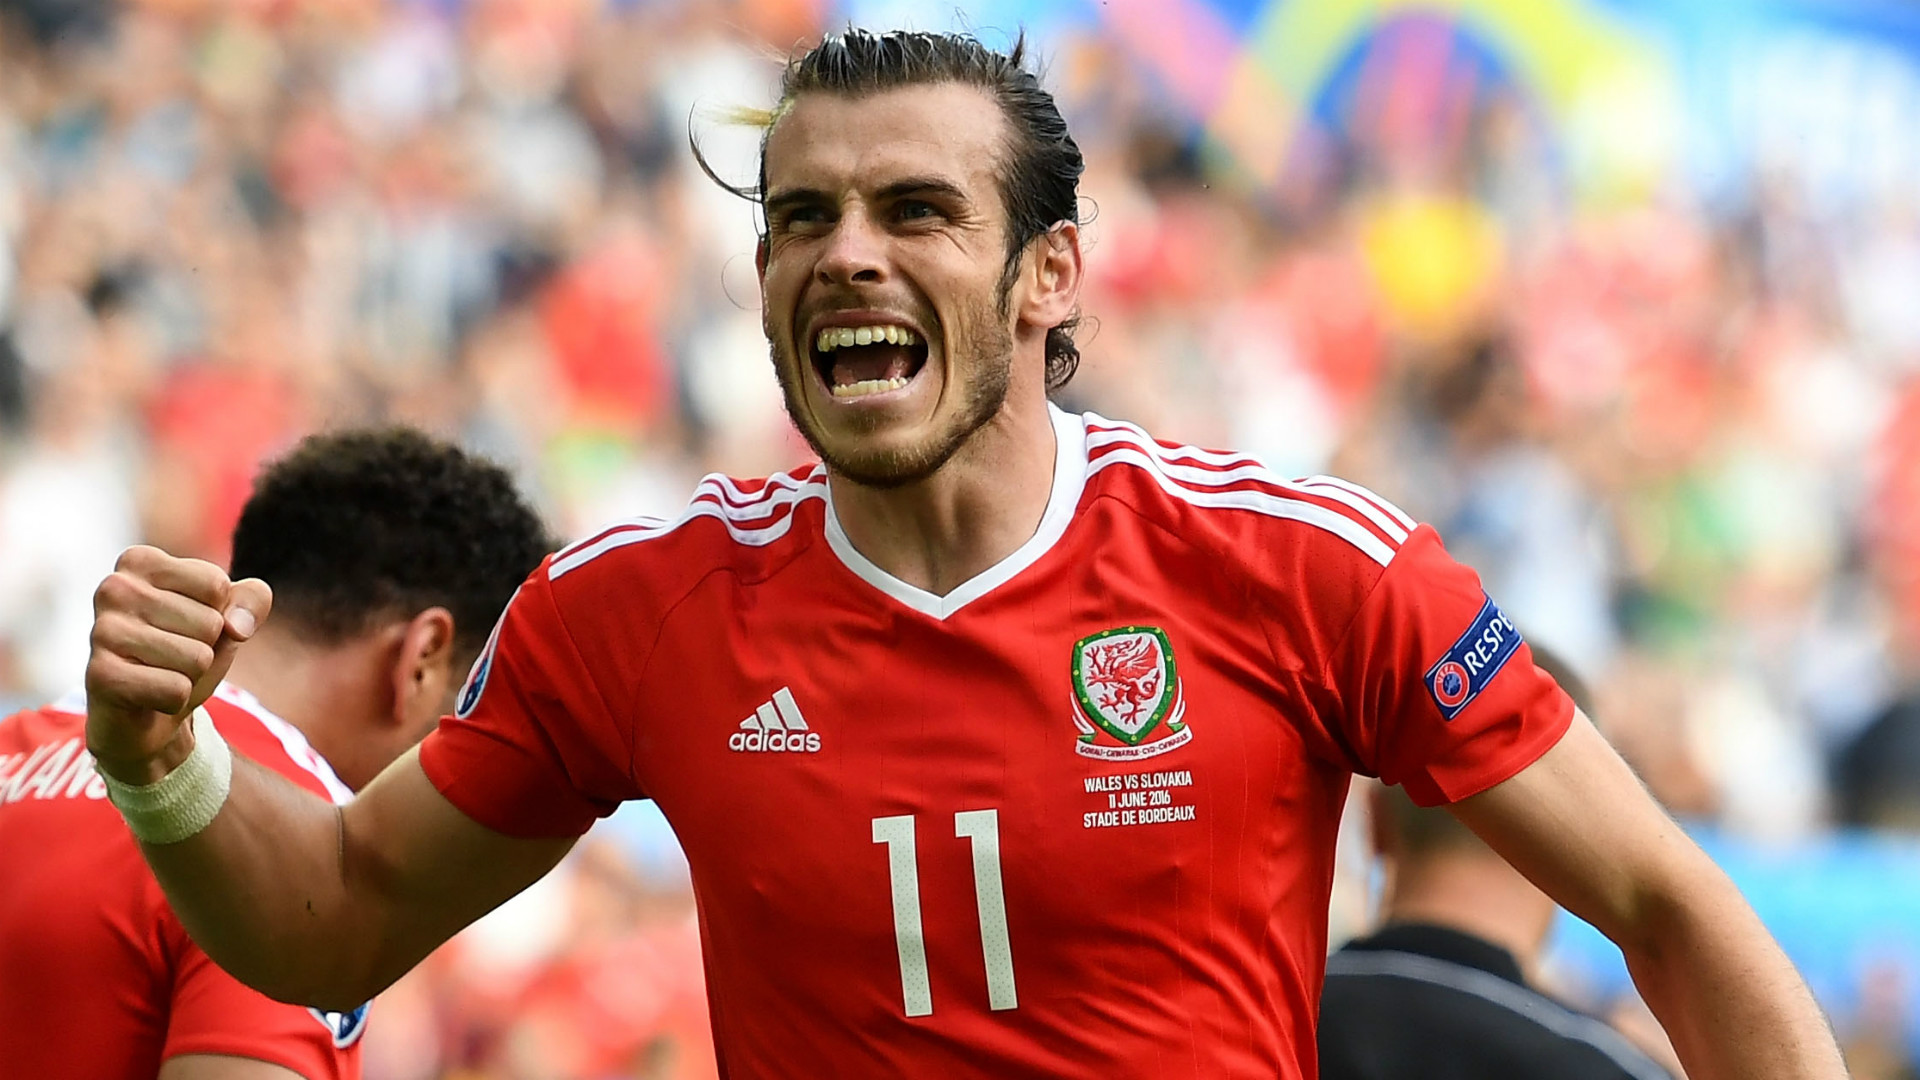 Hasil Pertandingan Piala Euro 2016 Rusia Vs Wales 0-3